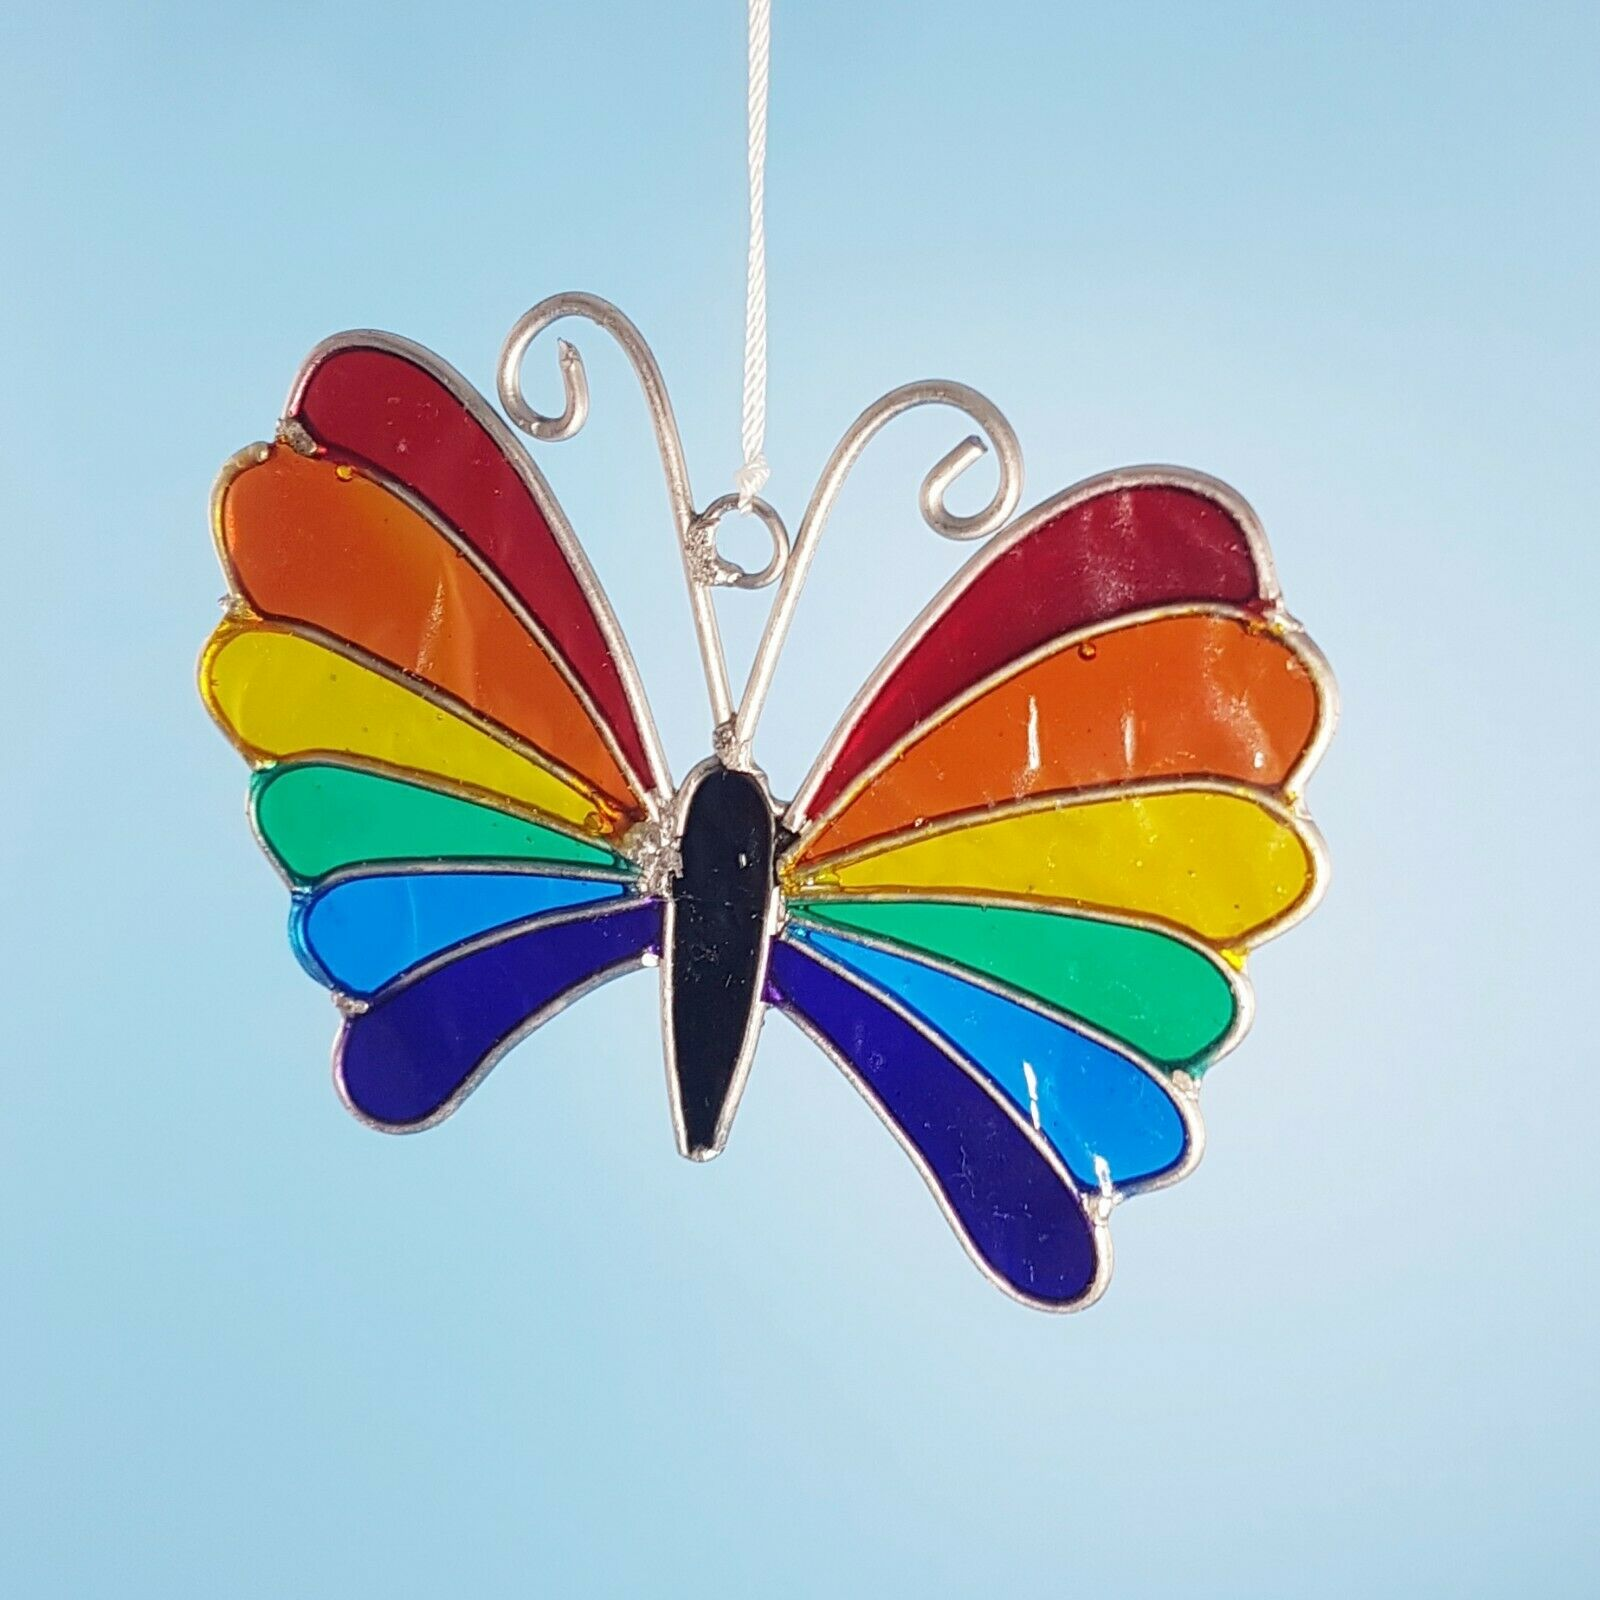 Rainbow butterfly mini sun catcher mobile stain glass effect garden decor gifts